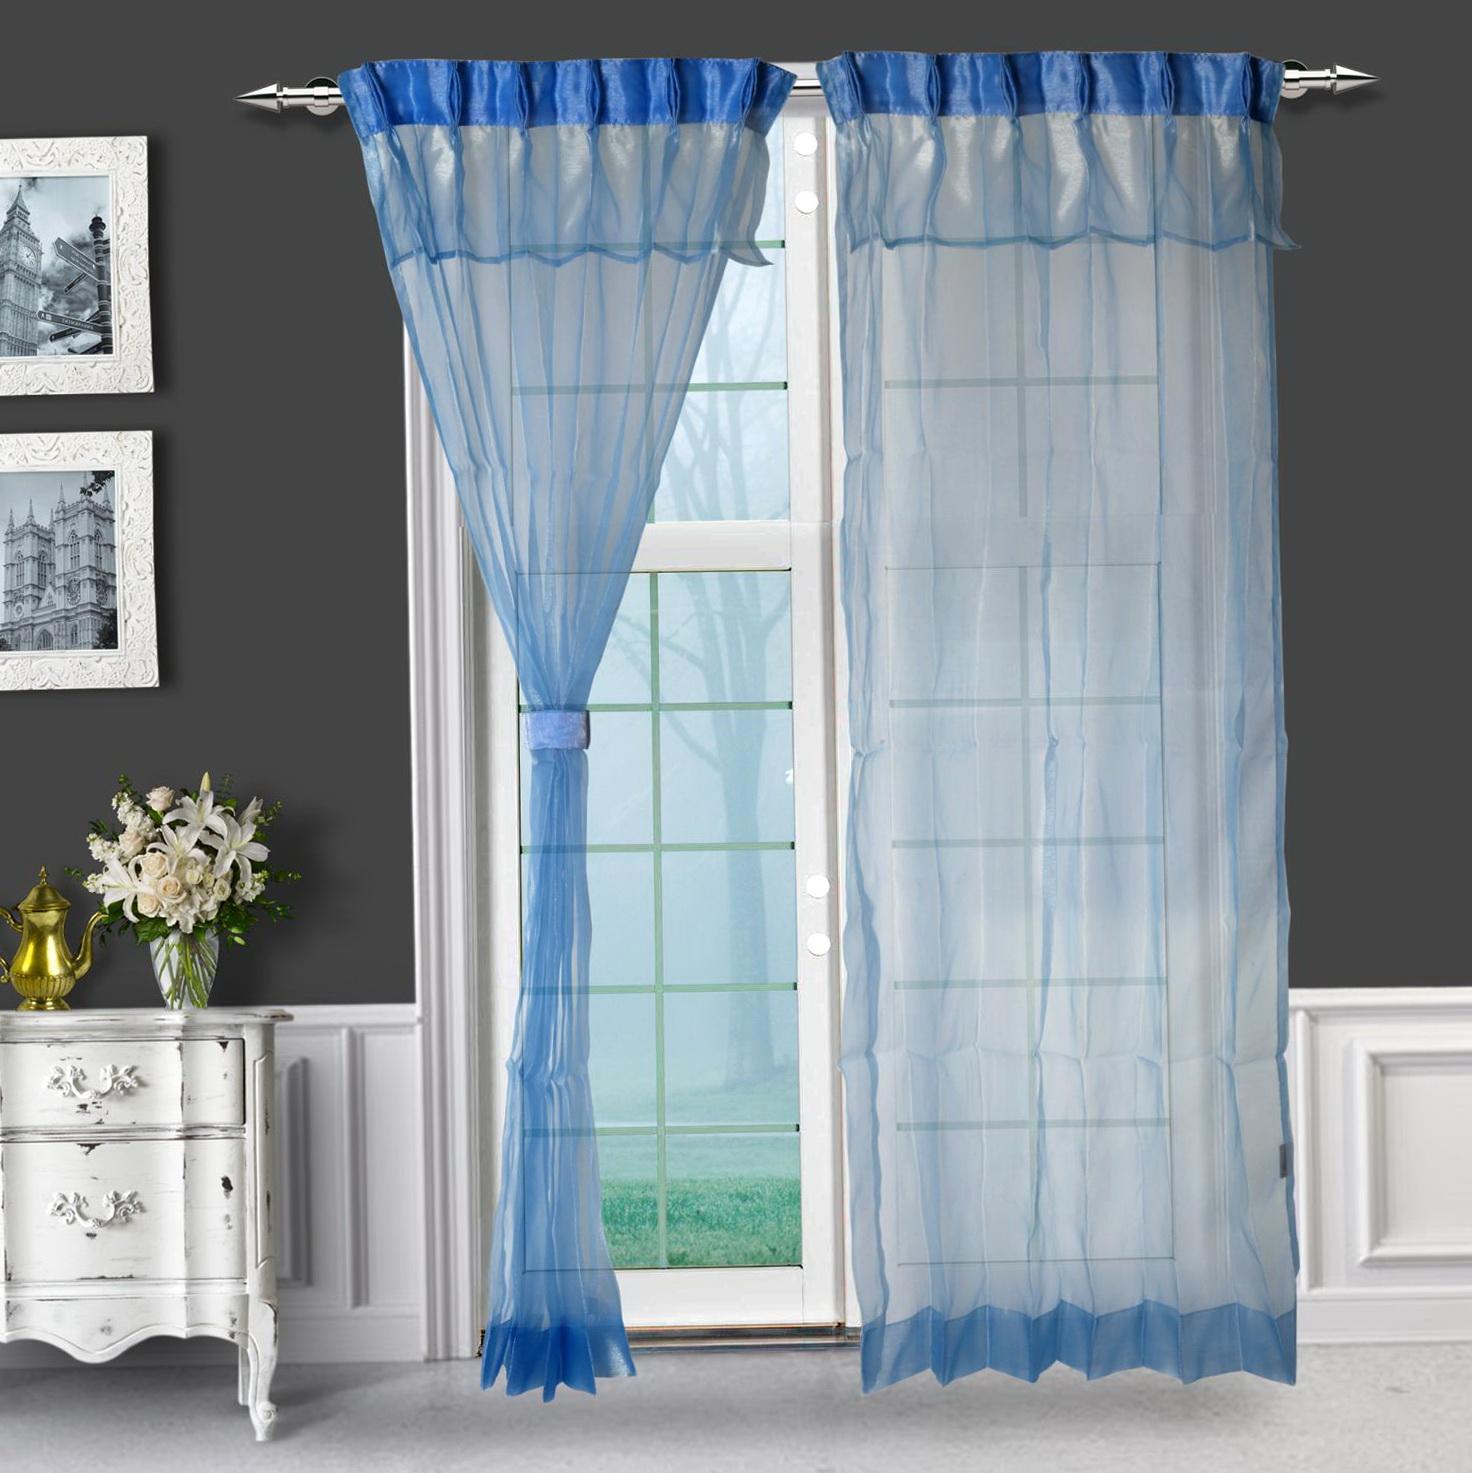 Buy Curtains Online Nz Home Design Ideas